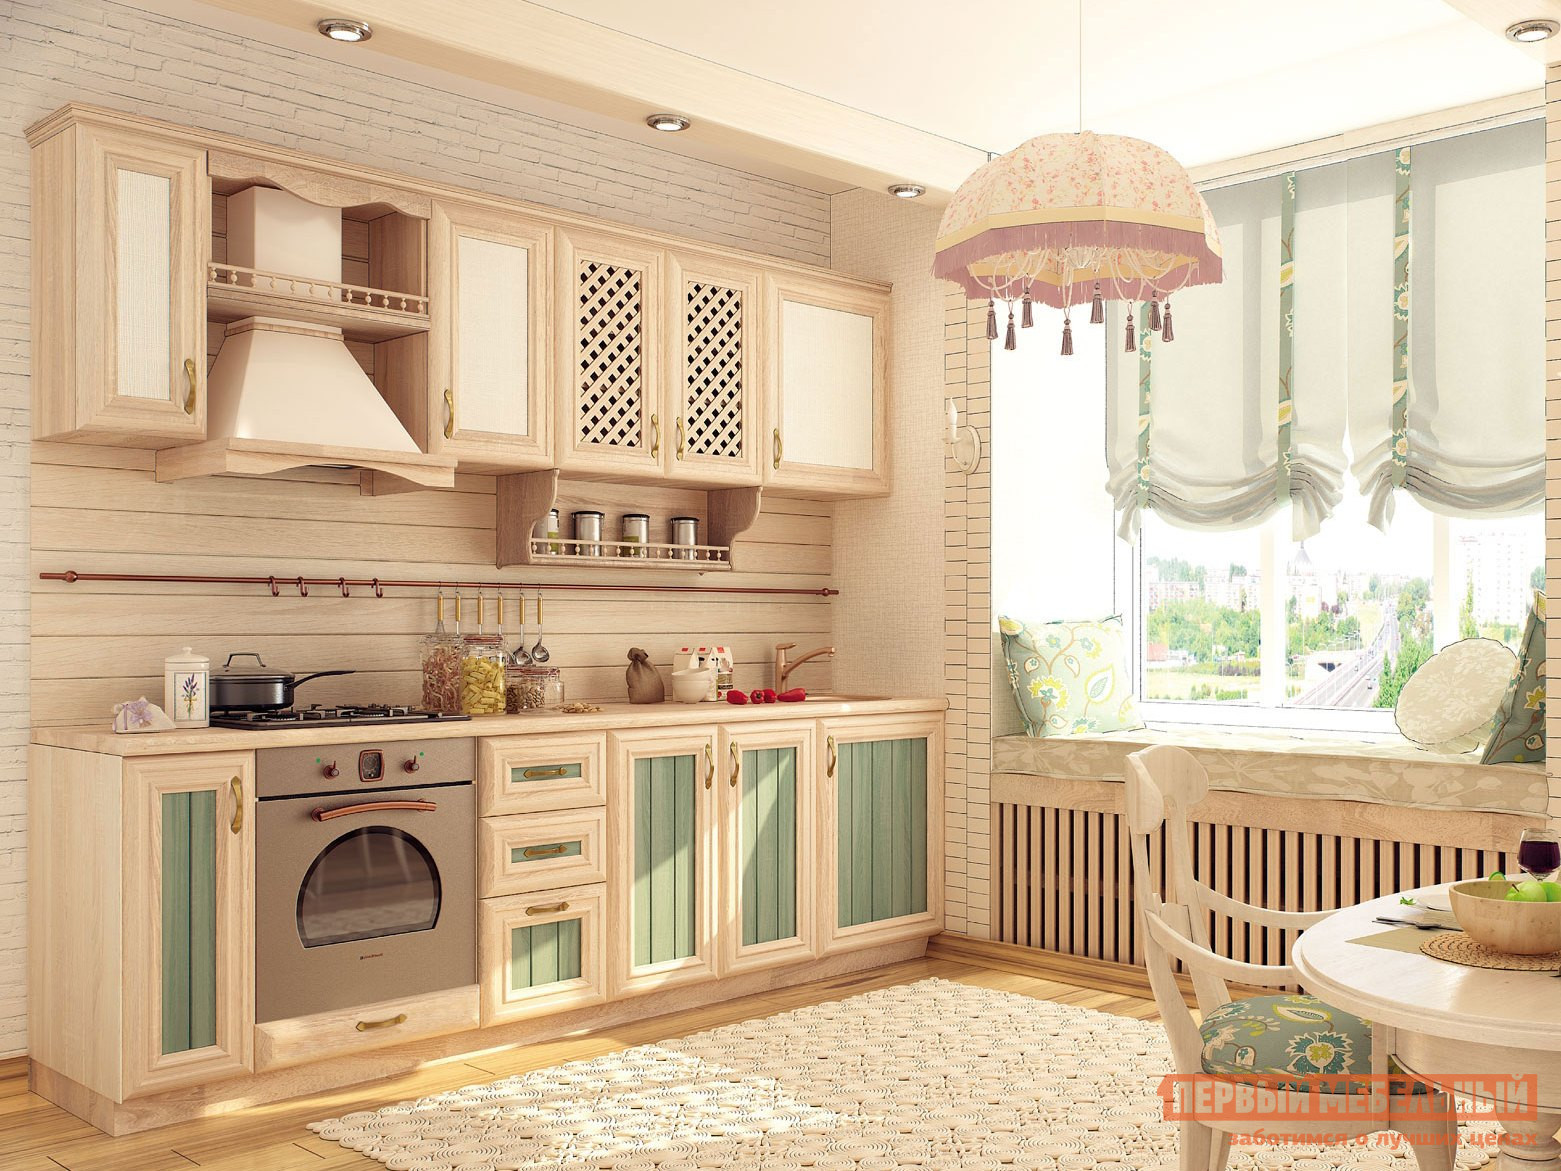 Кухонный гарнитур Любимый дом Кантри 260 см Сонома кухонный гарнитур трия фэнтези 150 см